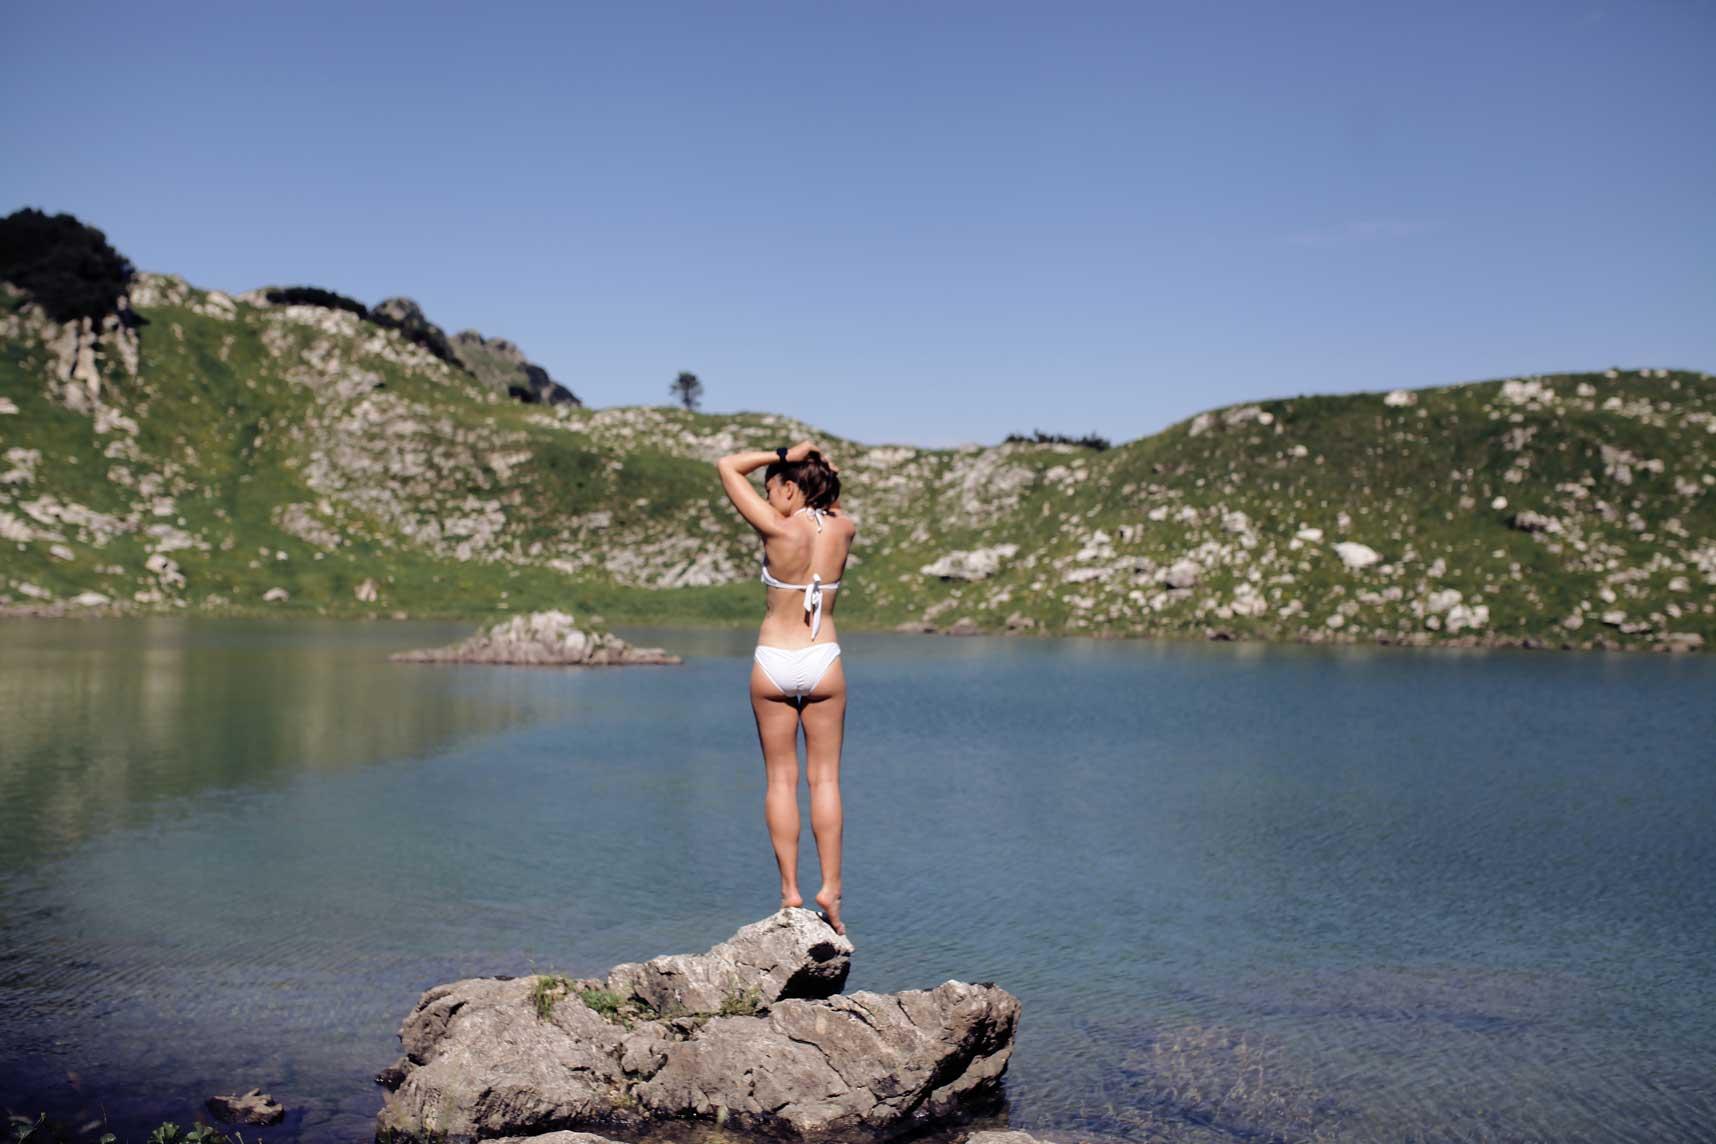 liz-kellerer-munichmountaingirls-schoenste-bergseen-gaisalpsee